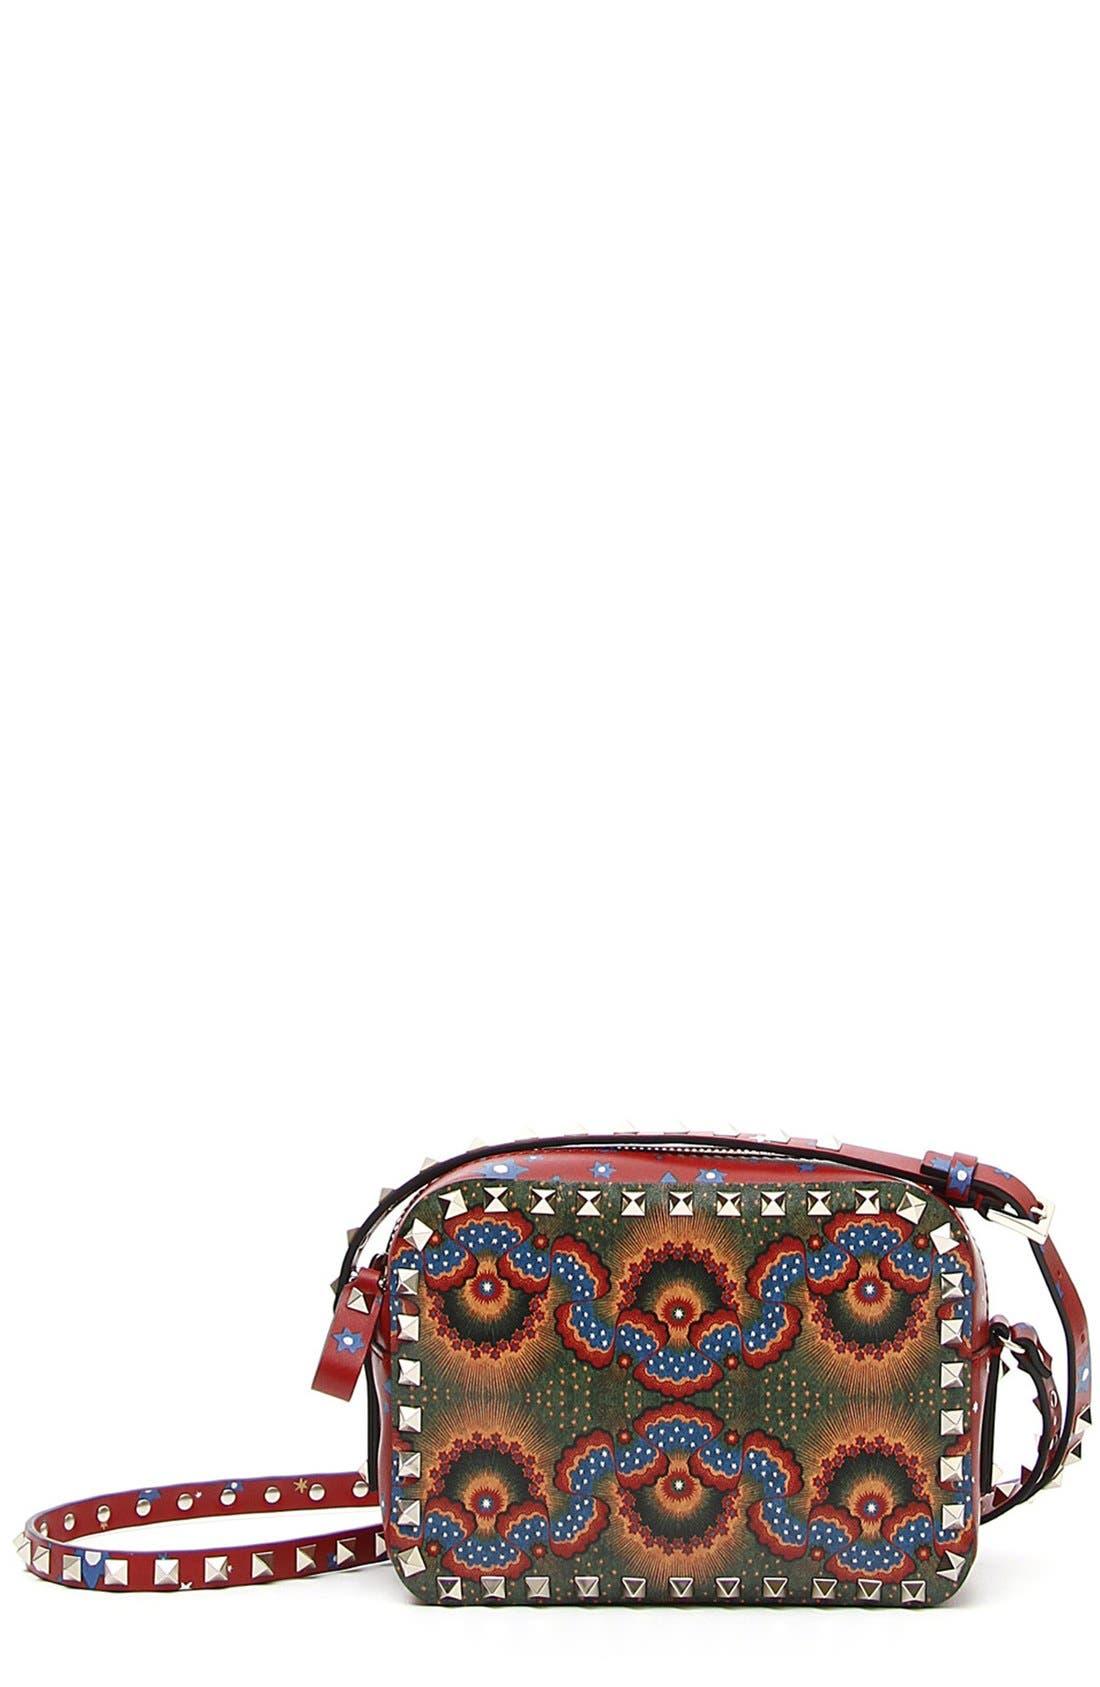 Main Image - Valentino 'Rockstud - Enchanted Wonderland' Calfskin Leather Camera Crossbody Bag